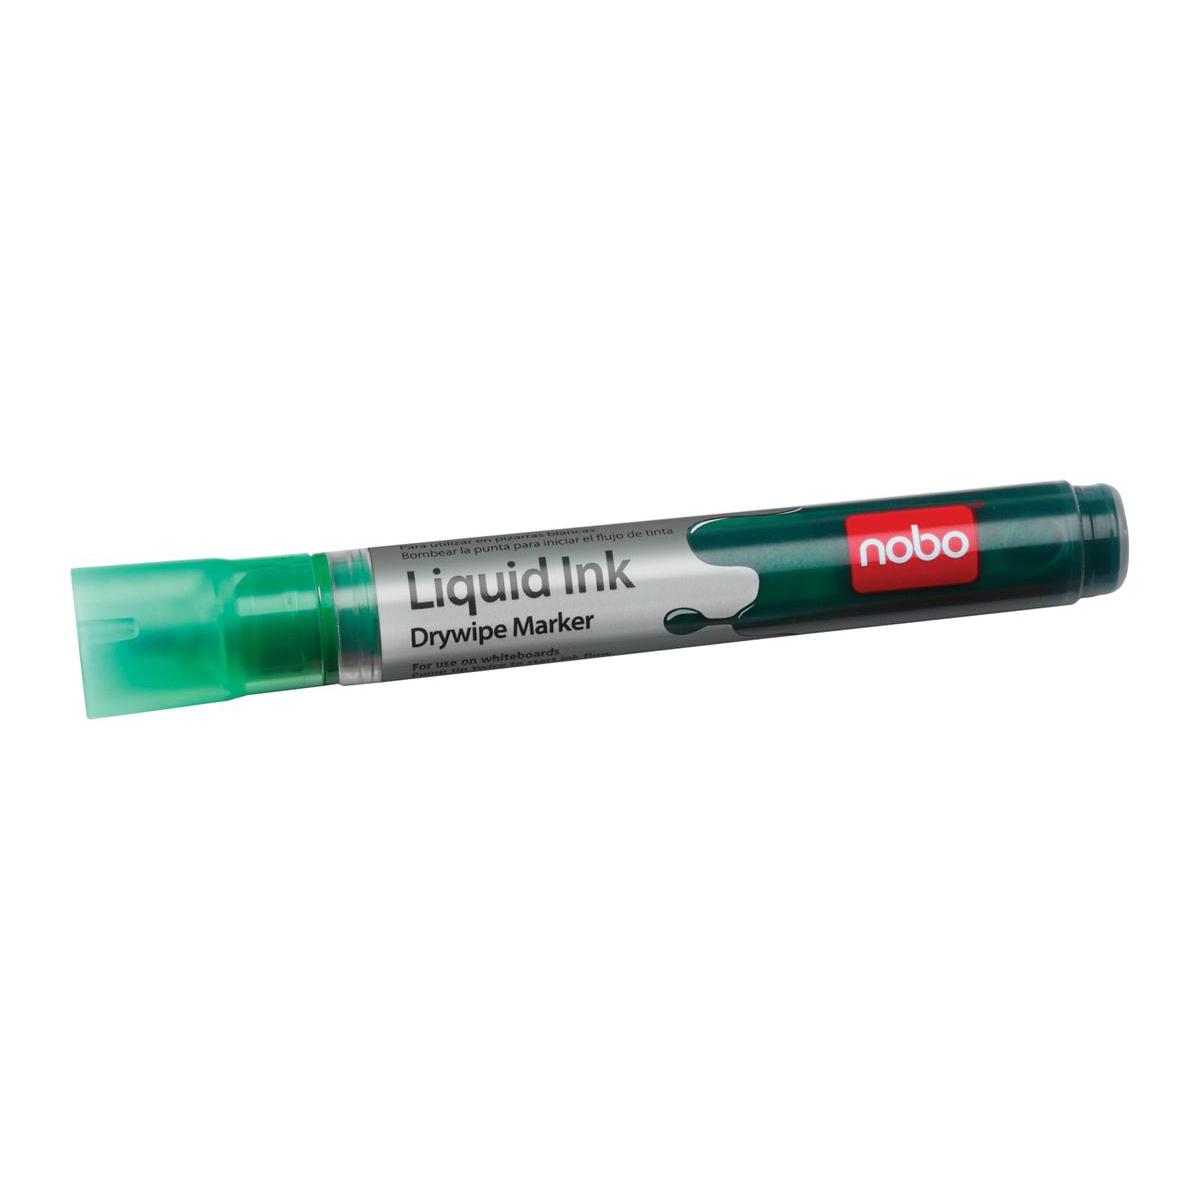 Nobo Liquid Ink Drymarker Drywipe Flipchart OHP Bullet Tip Line Width 3mm Green Ref 1901076 [Pack 12]